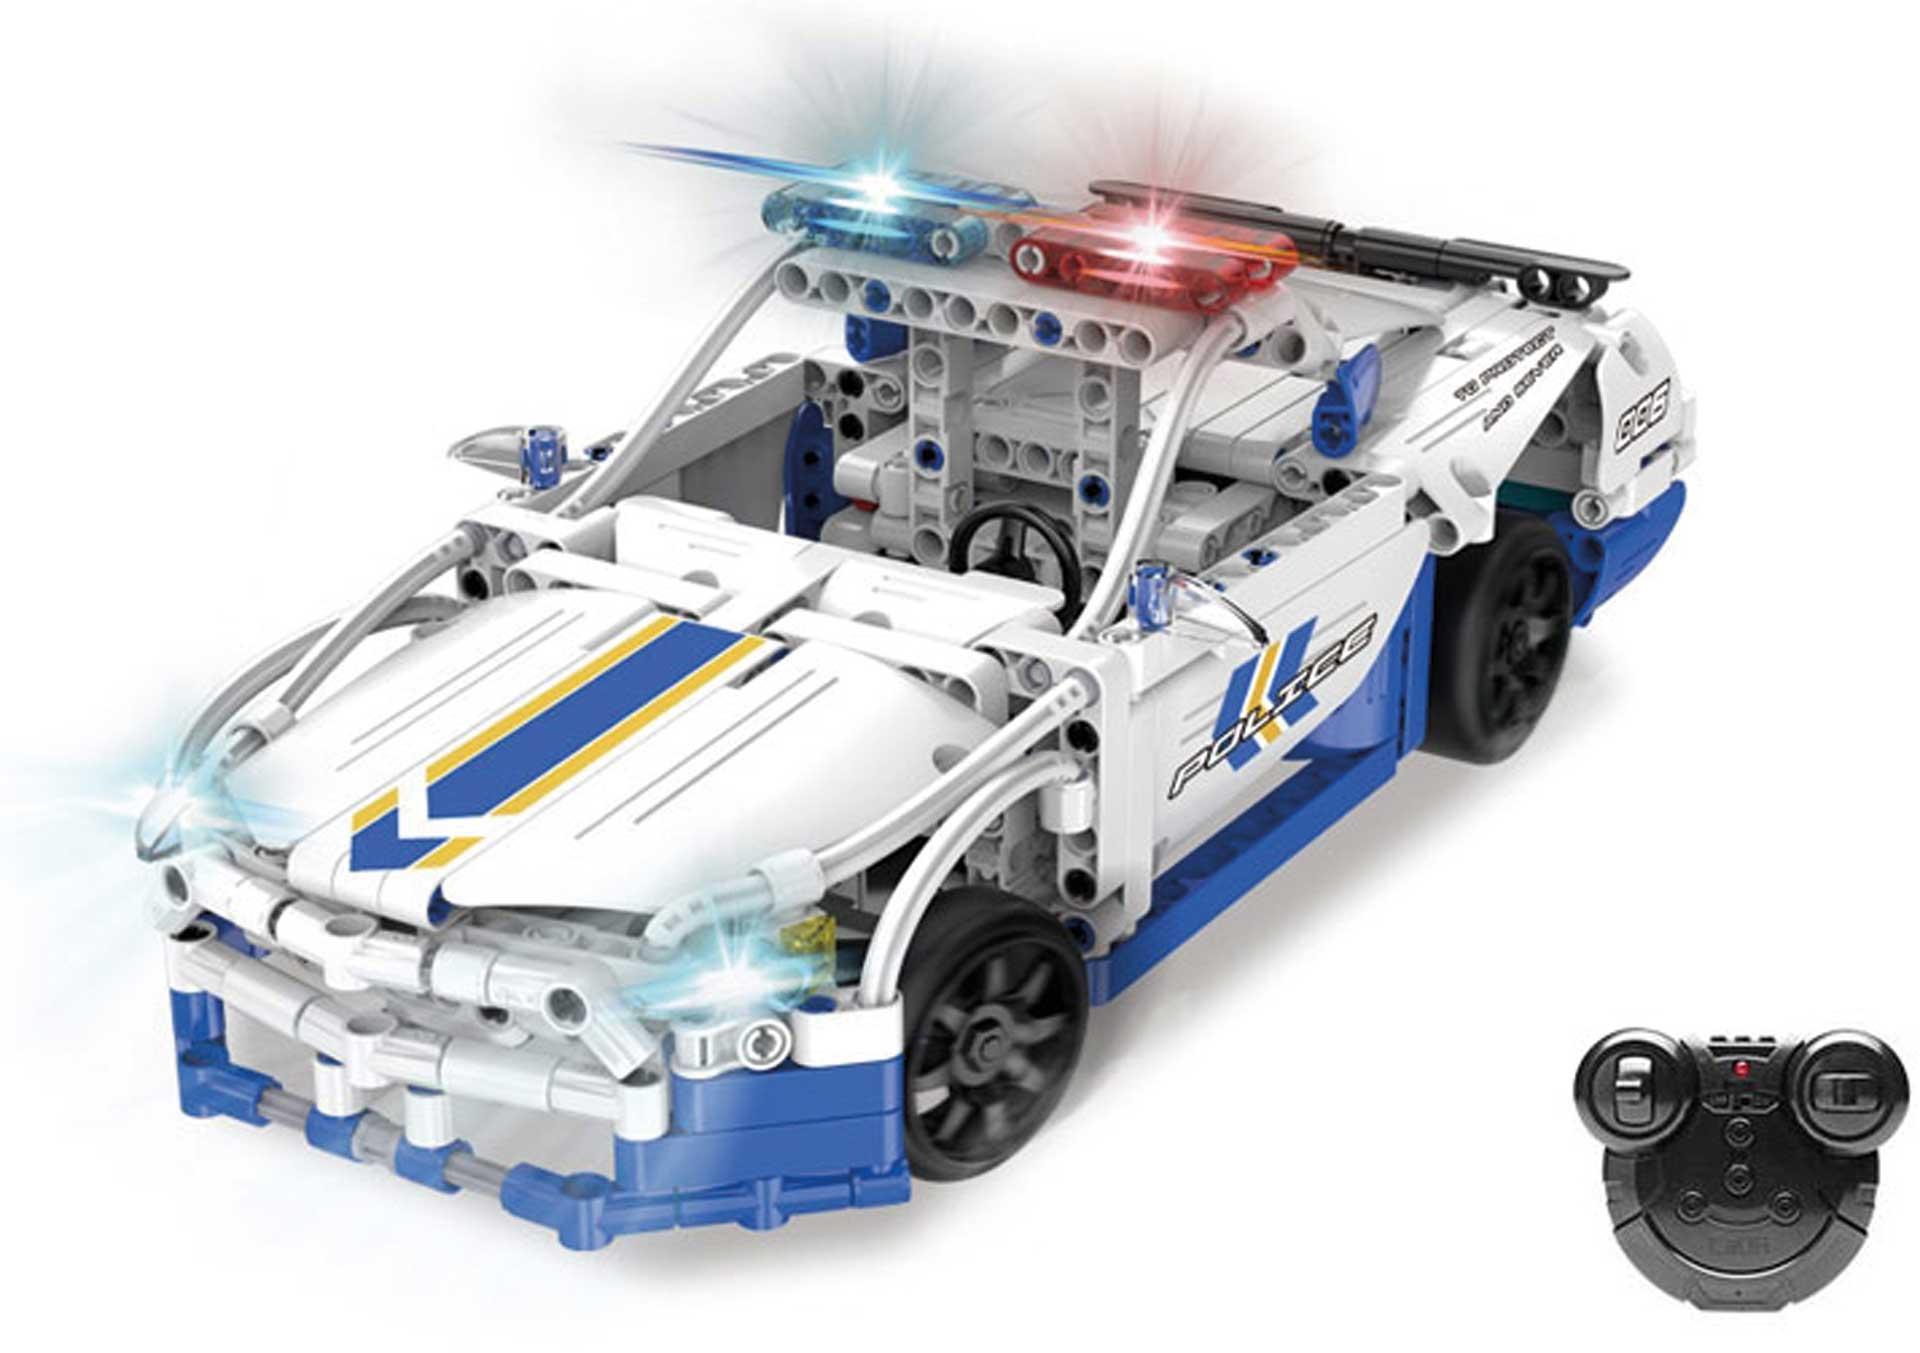 CaDA GT Police Car (430 Teile) Klemmbausteine ferngesteuert